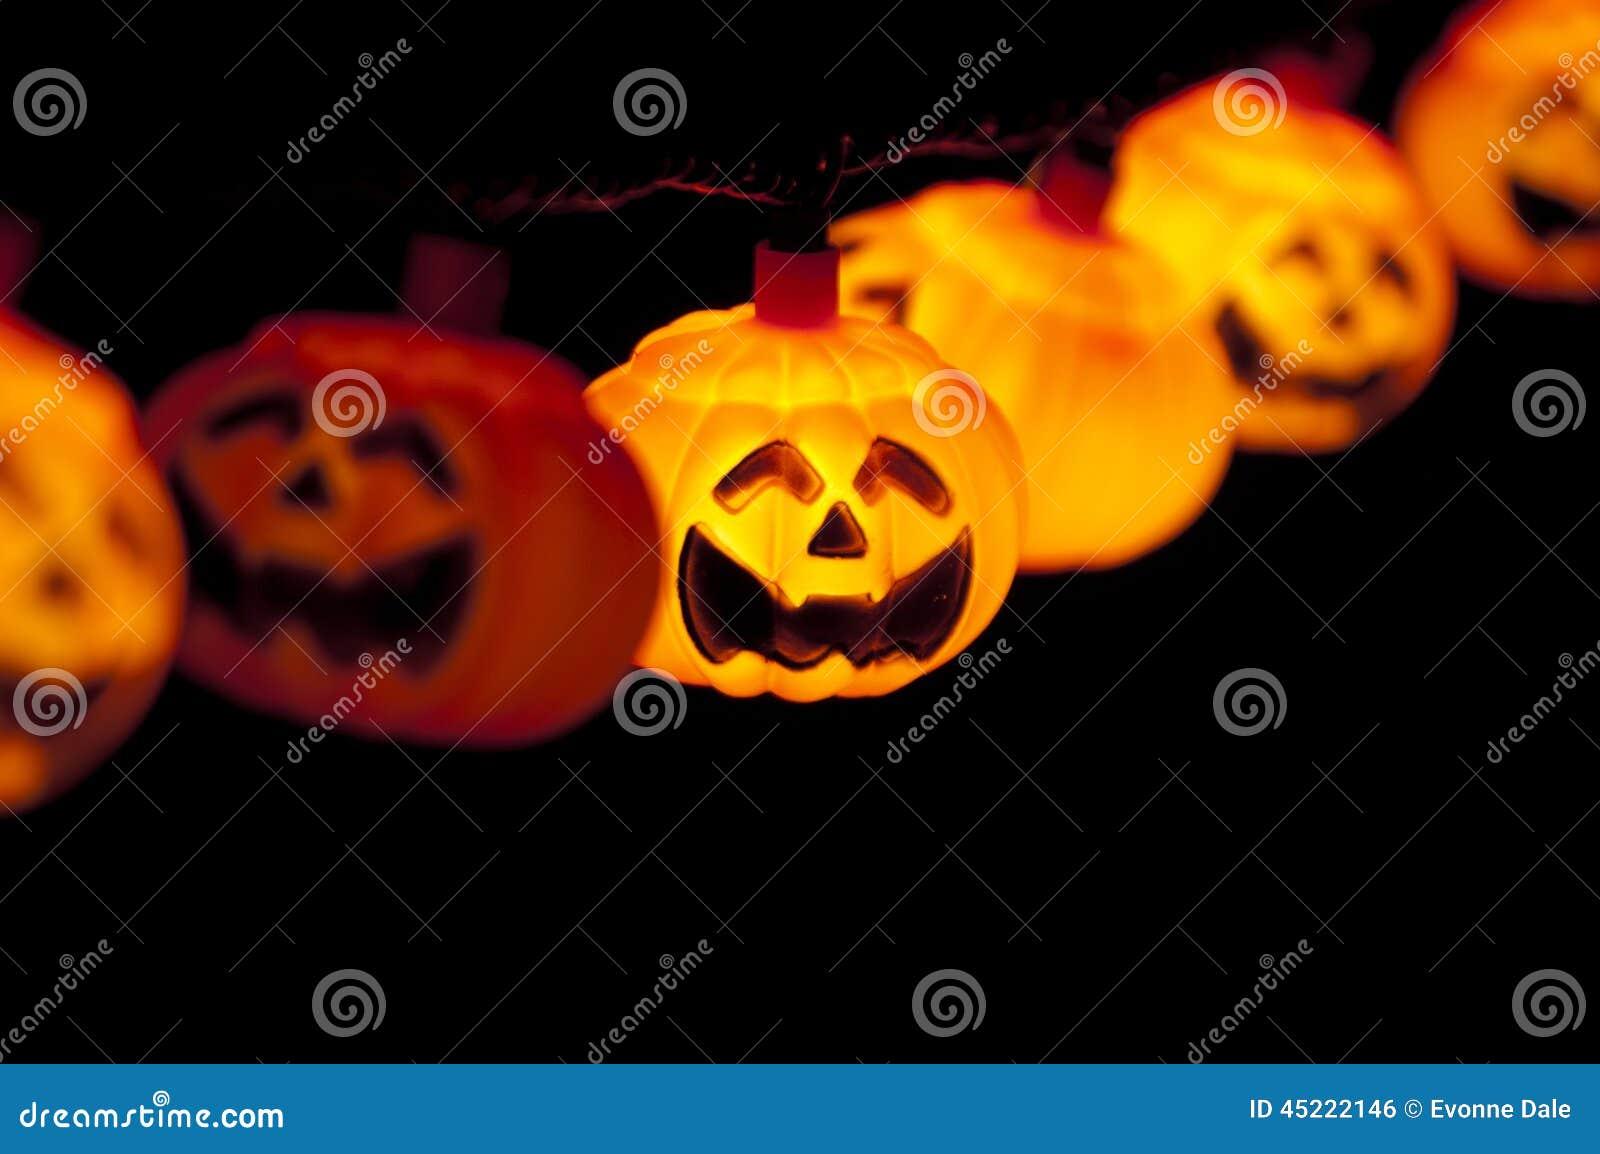 Pumpkin Lights Hanging Stock Photo - Image: 45222146